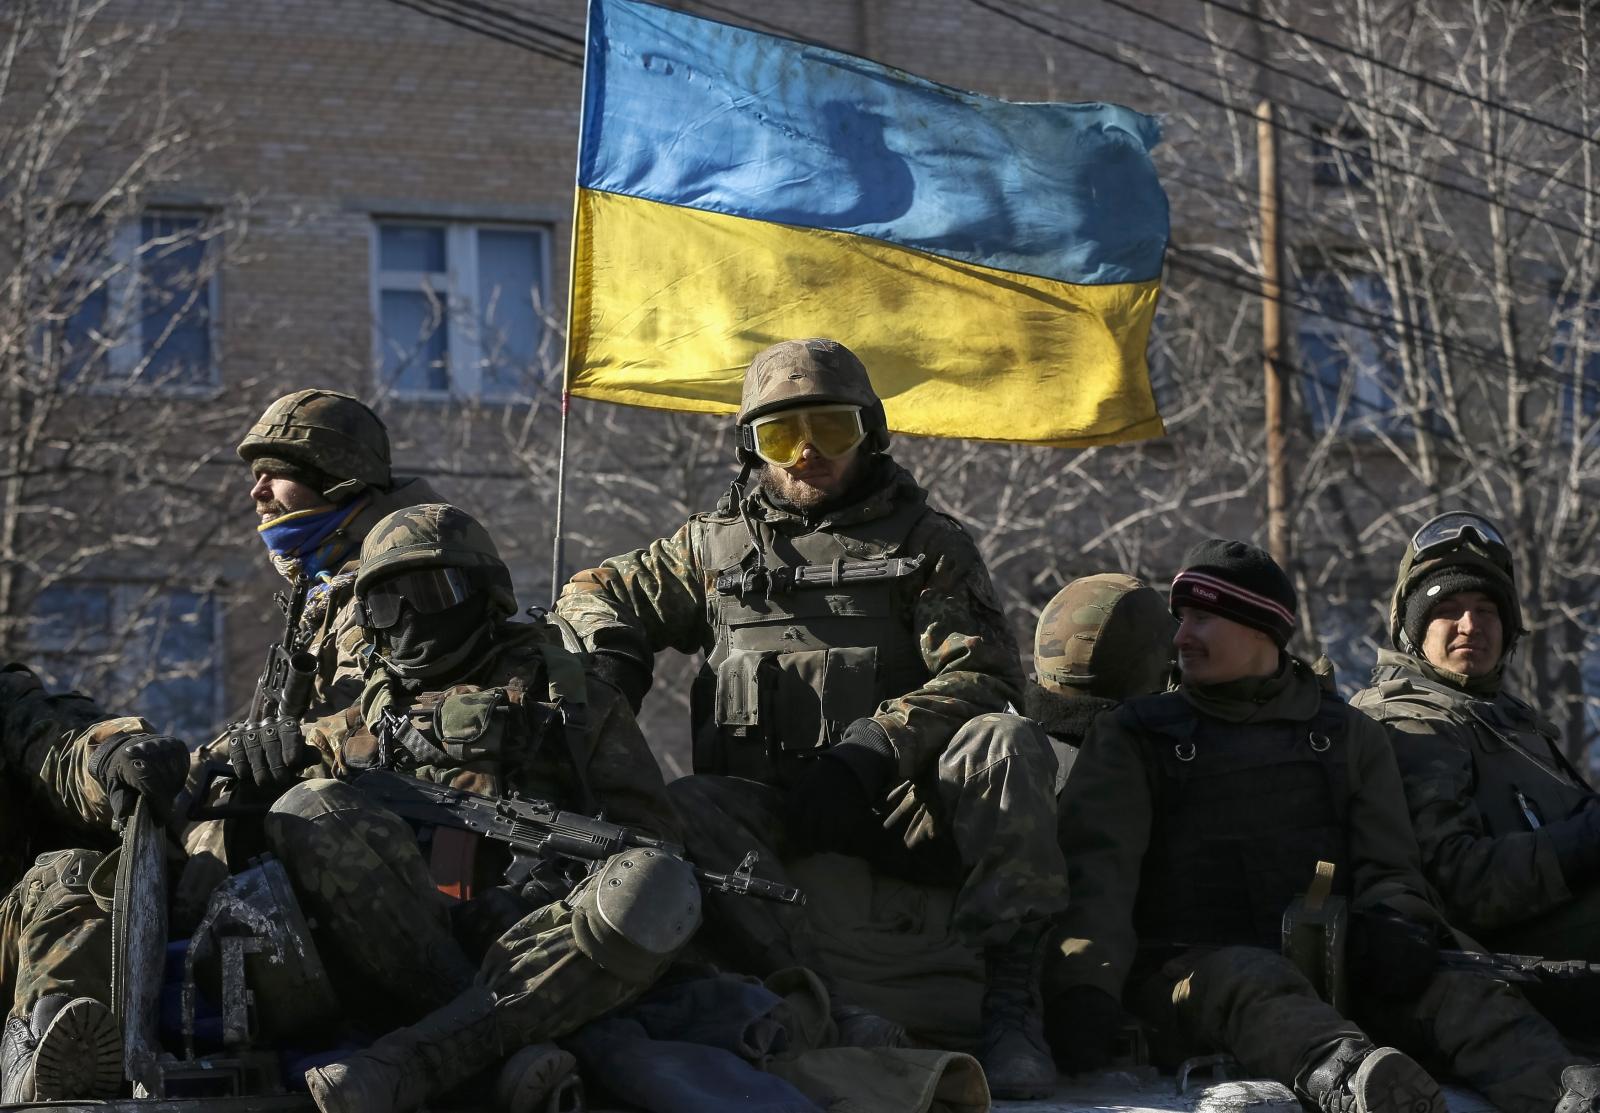 Ukraine forces